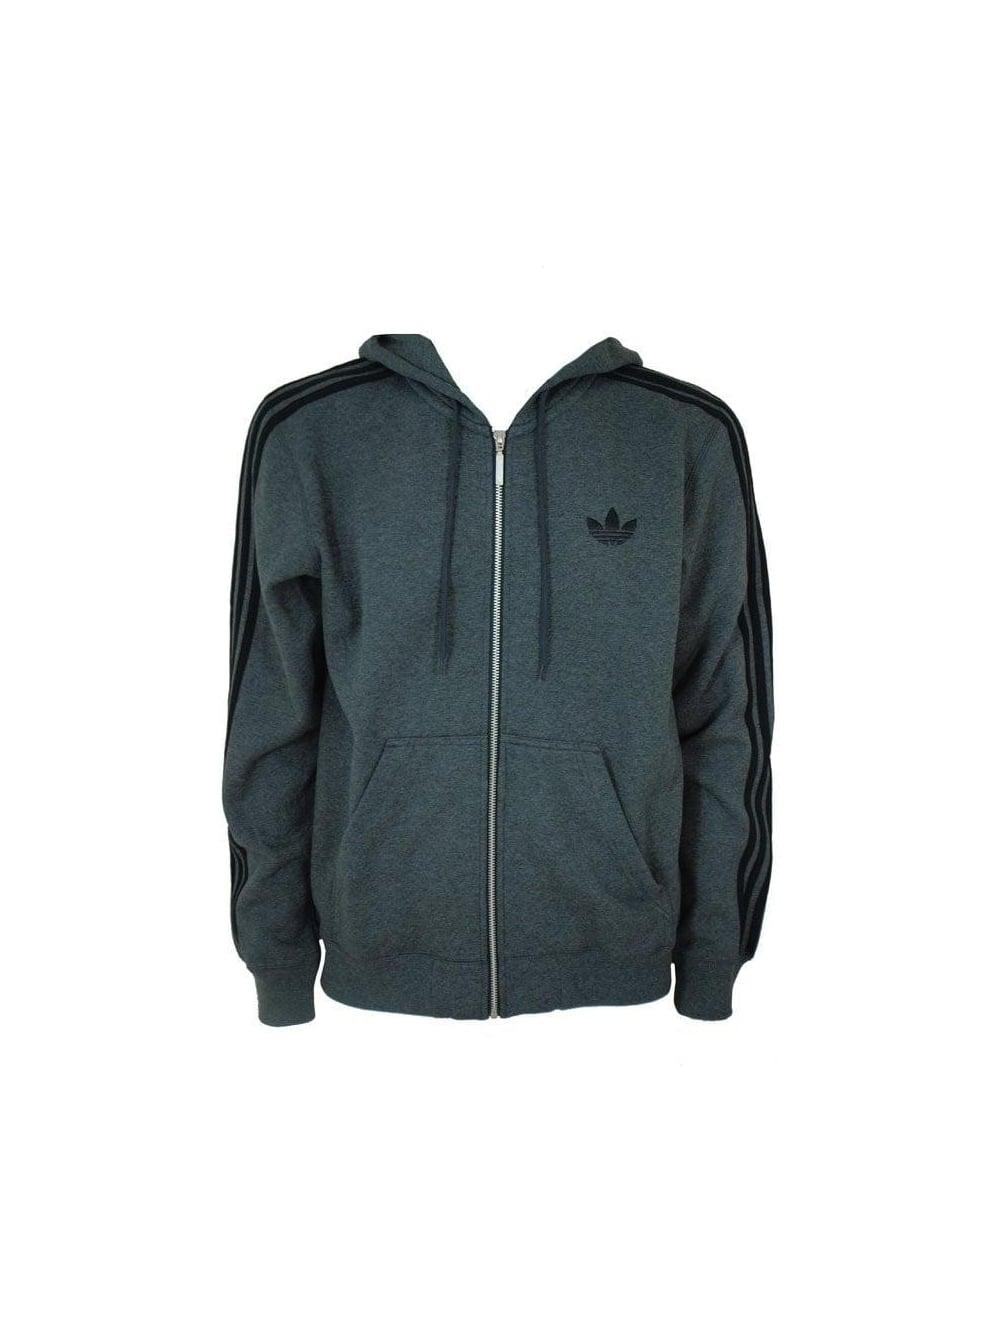 Adidas Spo Hooded Flock Jacket in Dark Grey - Northern Threads 592c6a1be